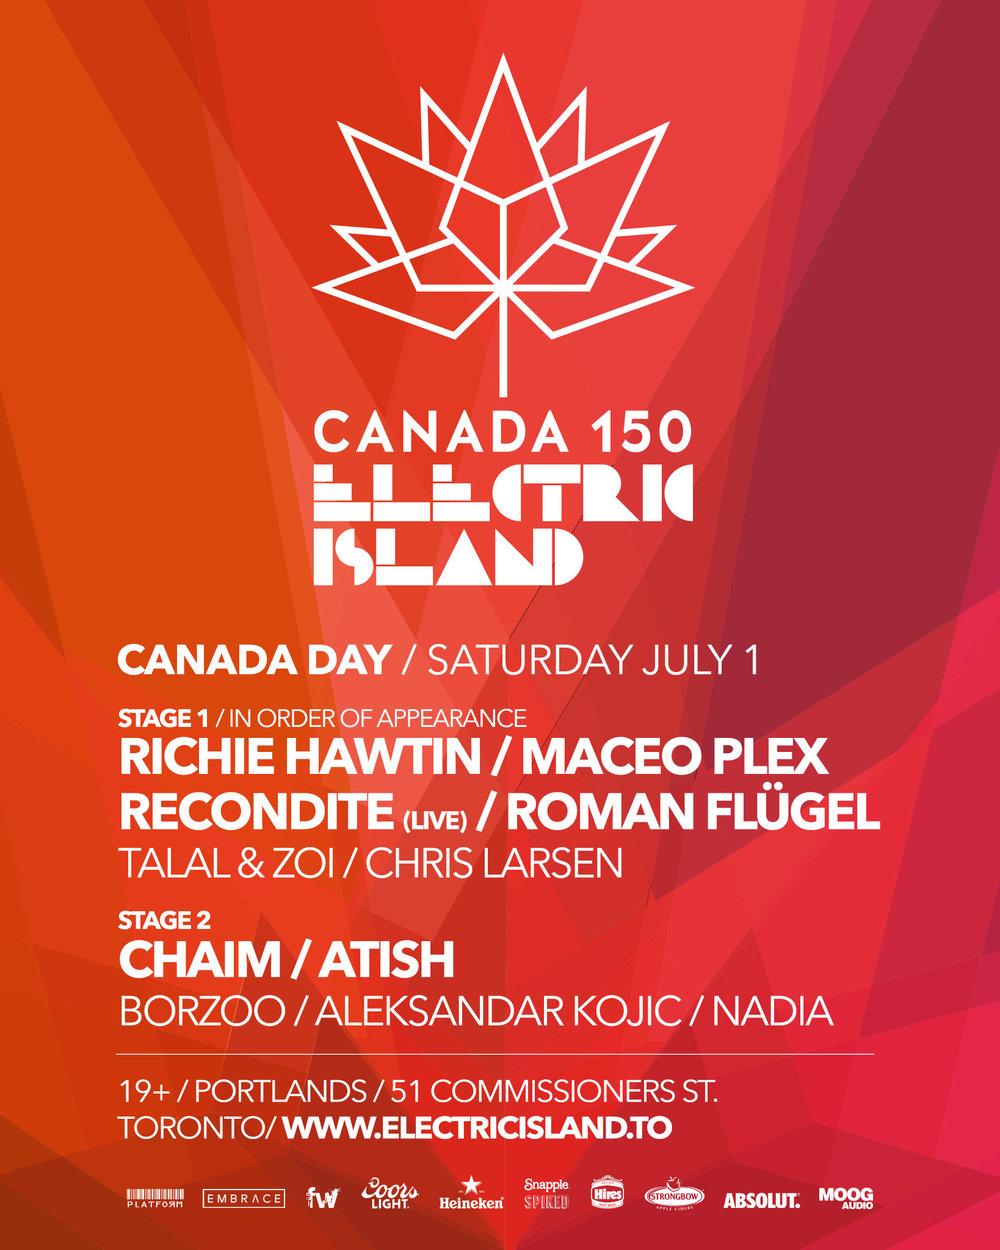 Electric island_Canada